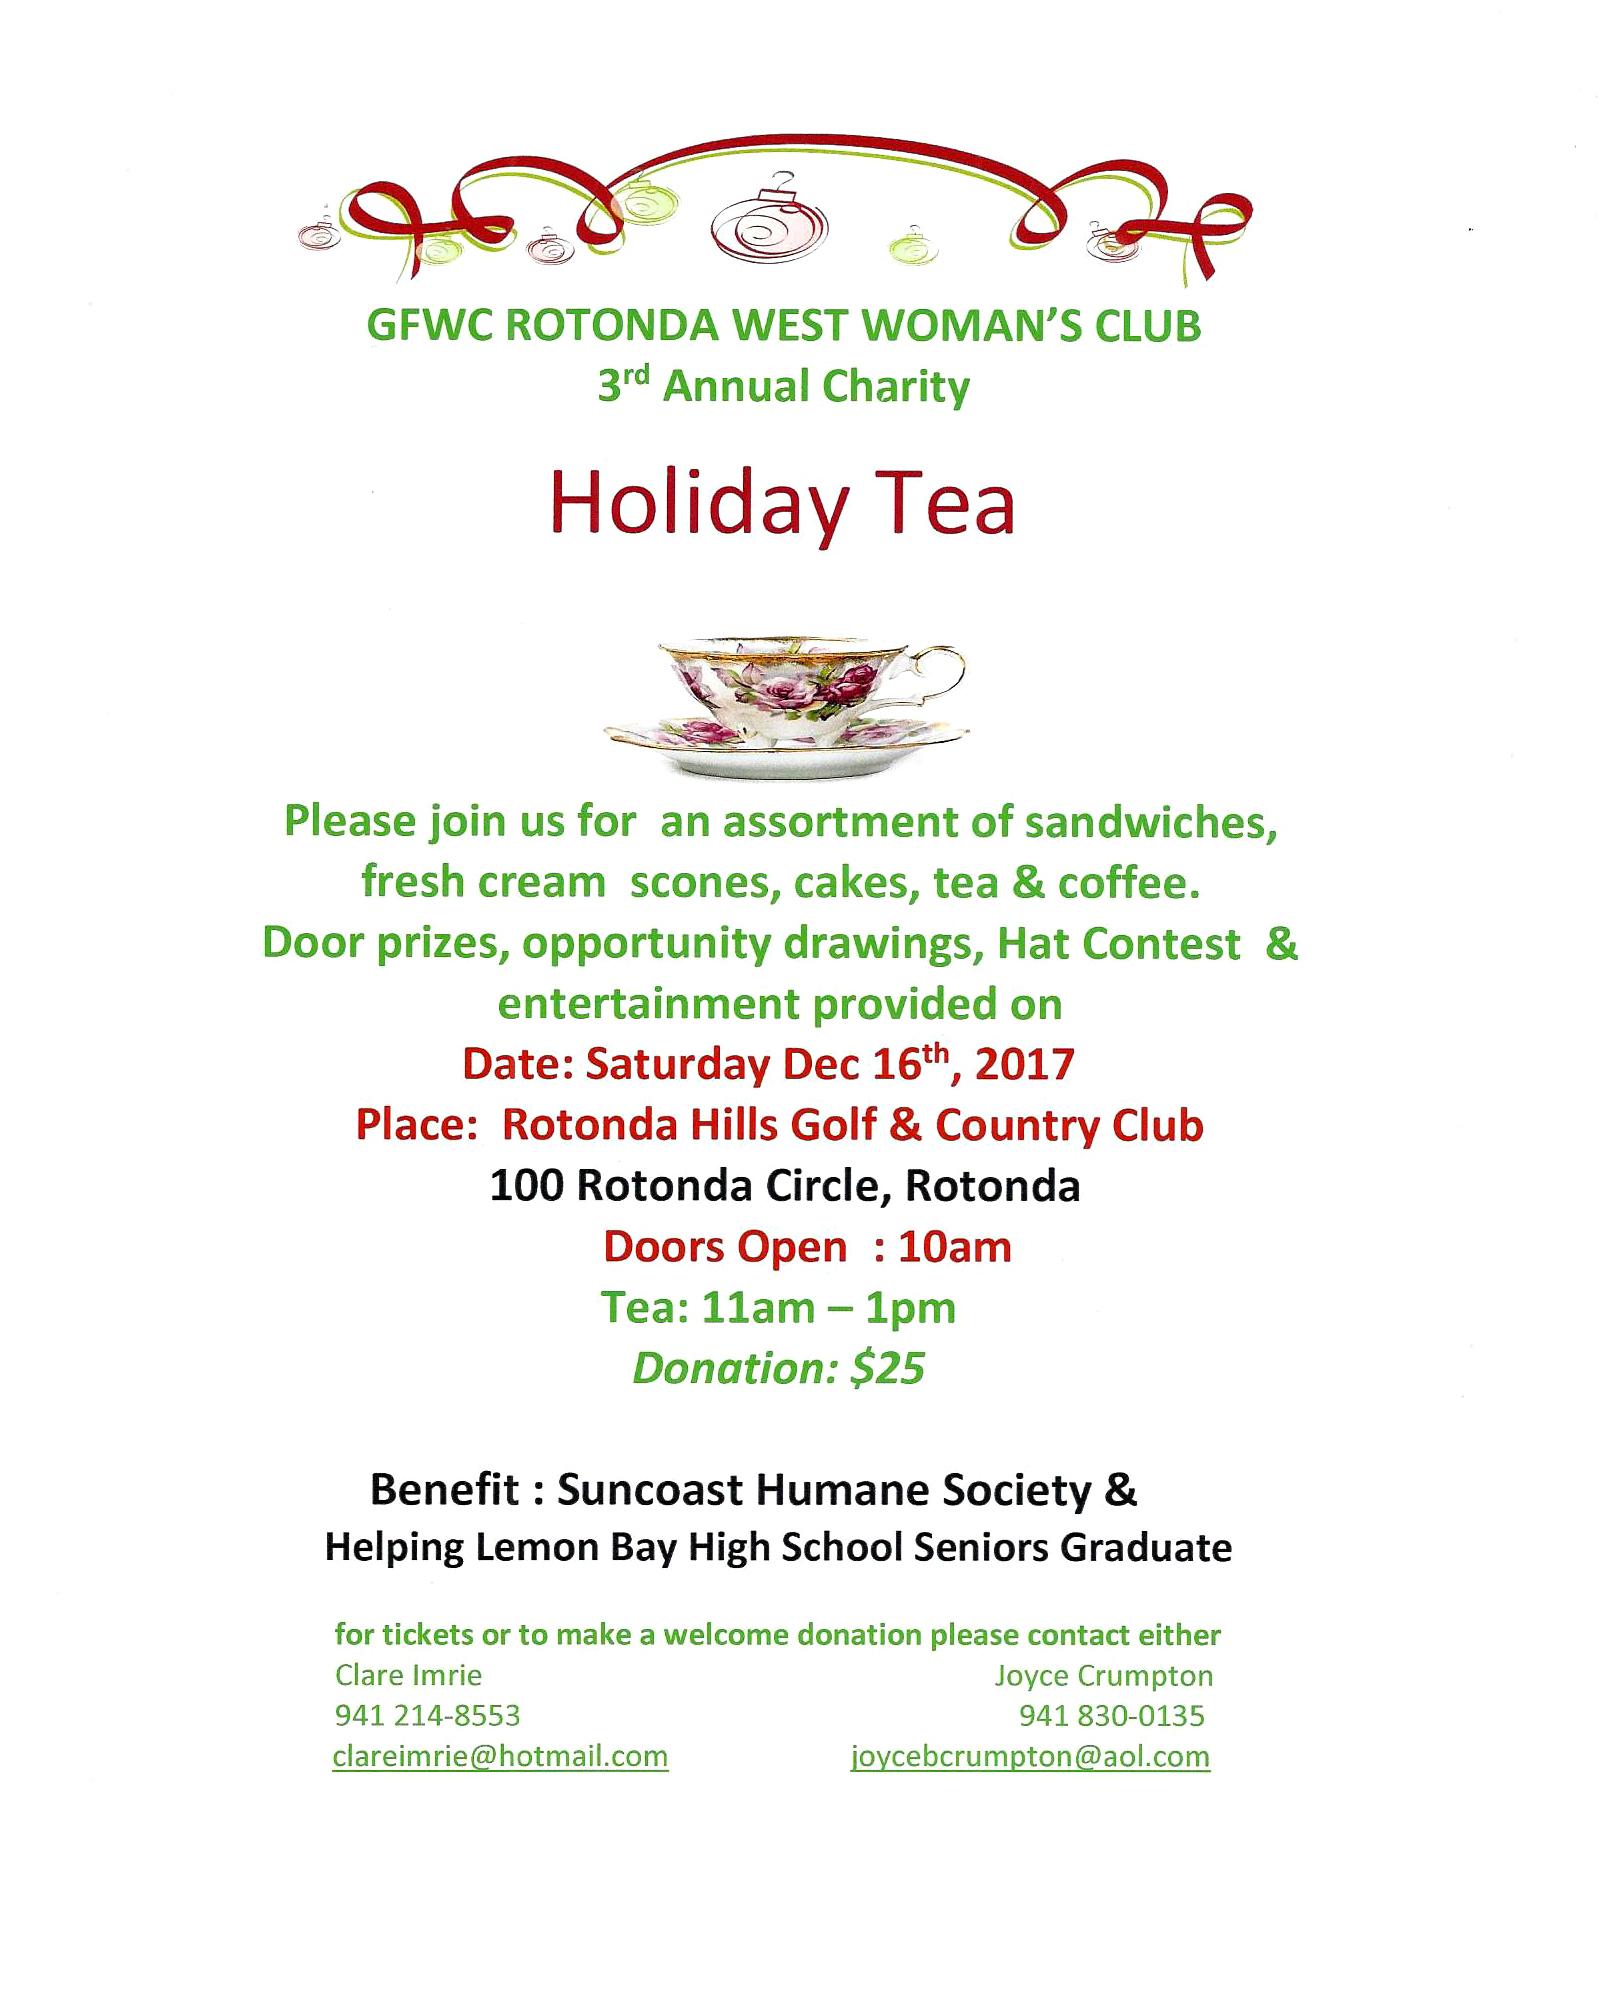 GFWC EVENT holiday tea.jpg